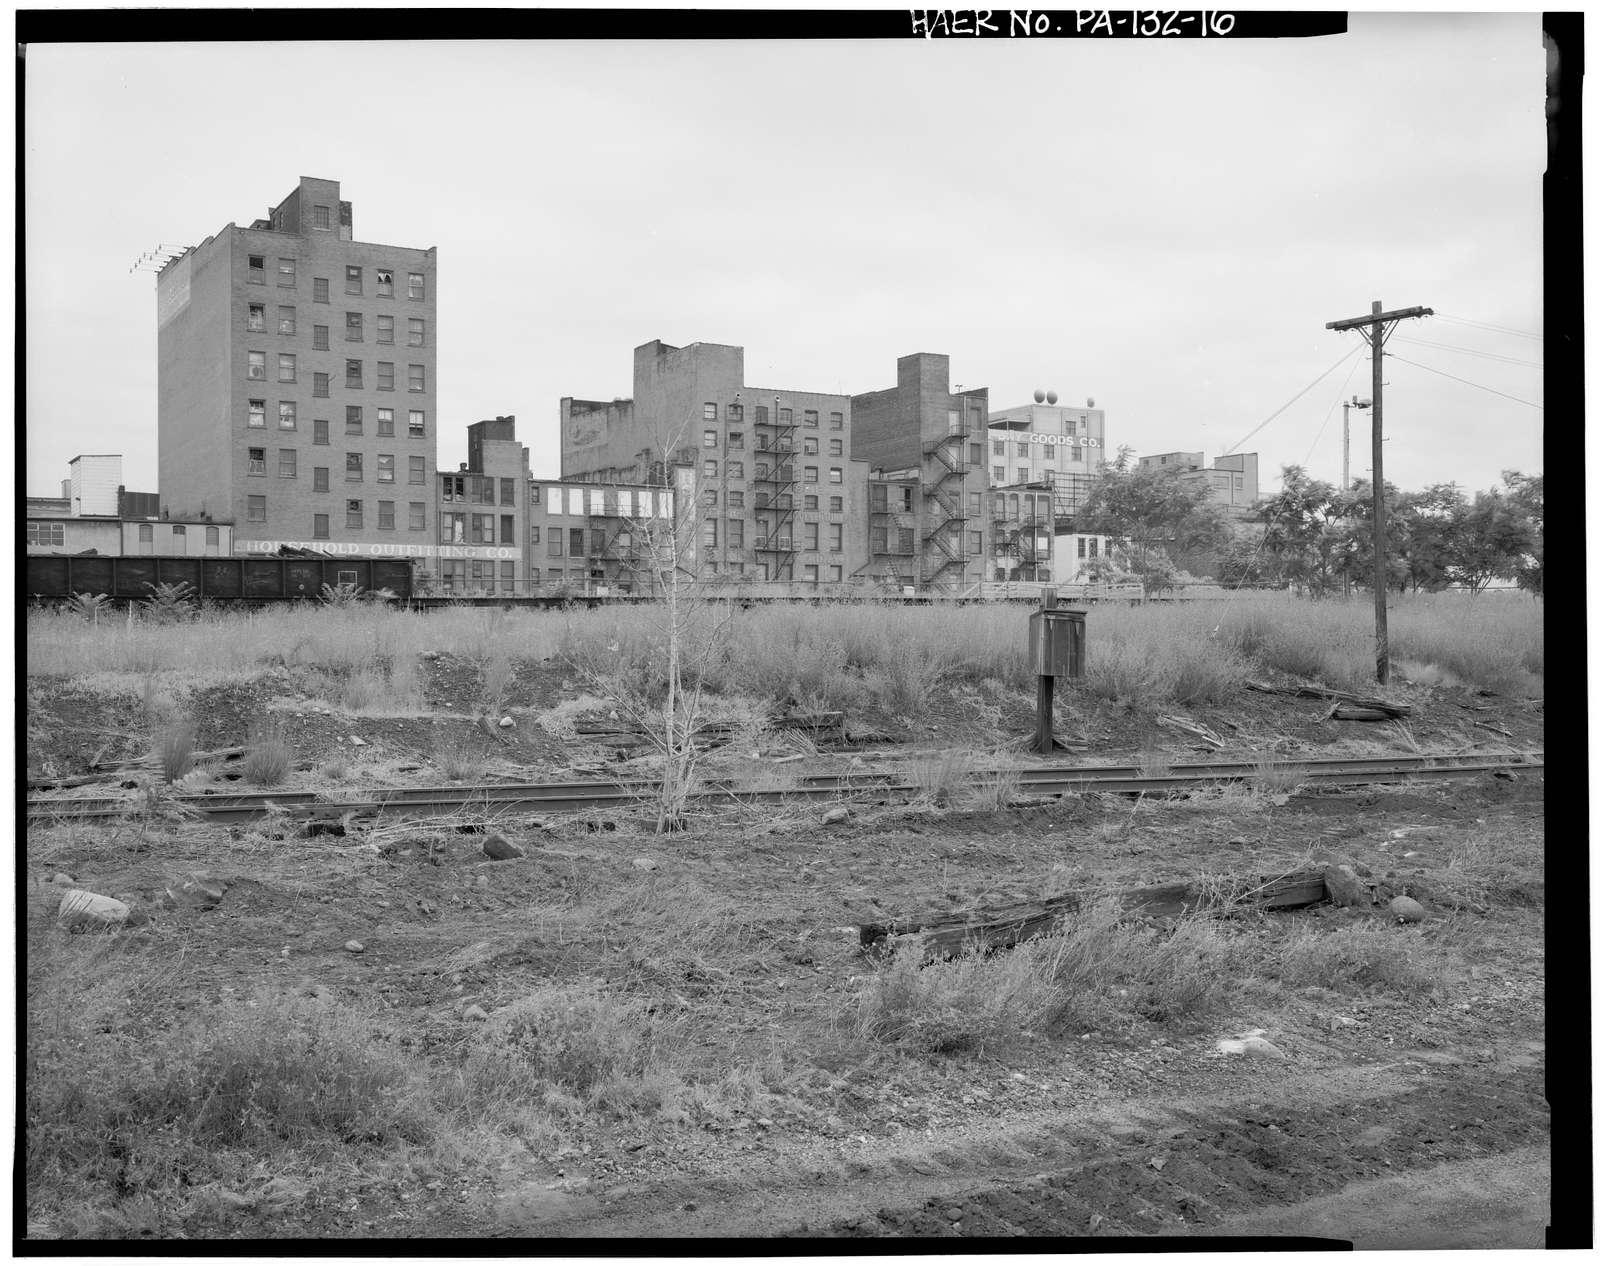 Delaware, Lackawanna & Western Railroad, Scranton Yards, Lackawanna Avenue, Cedar Avenue, River Street & Seventh Avenue, Scranton, Lackawanna County, PA